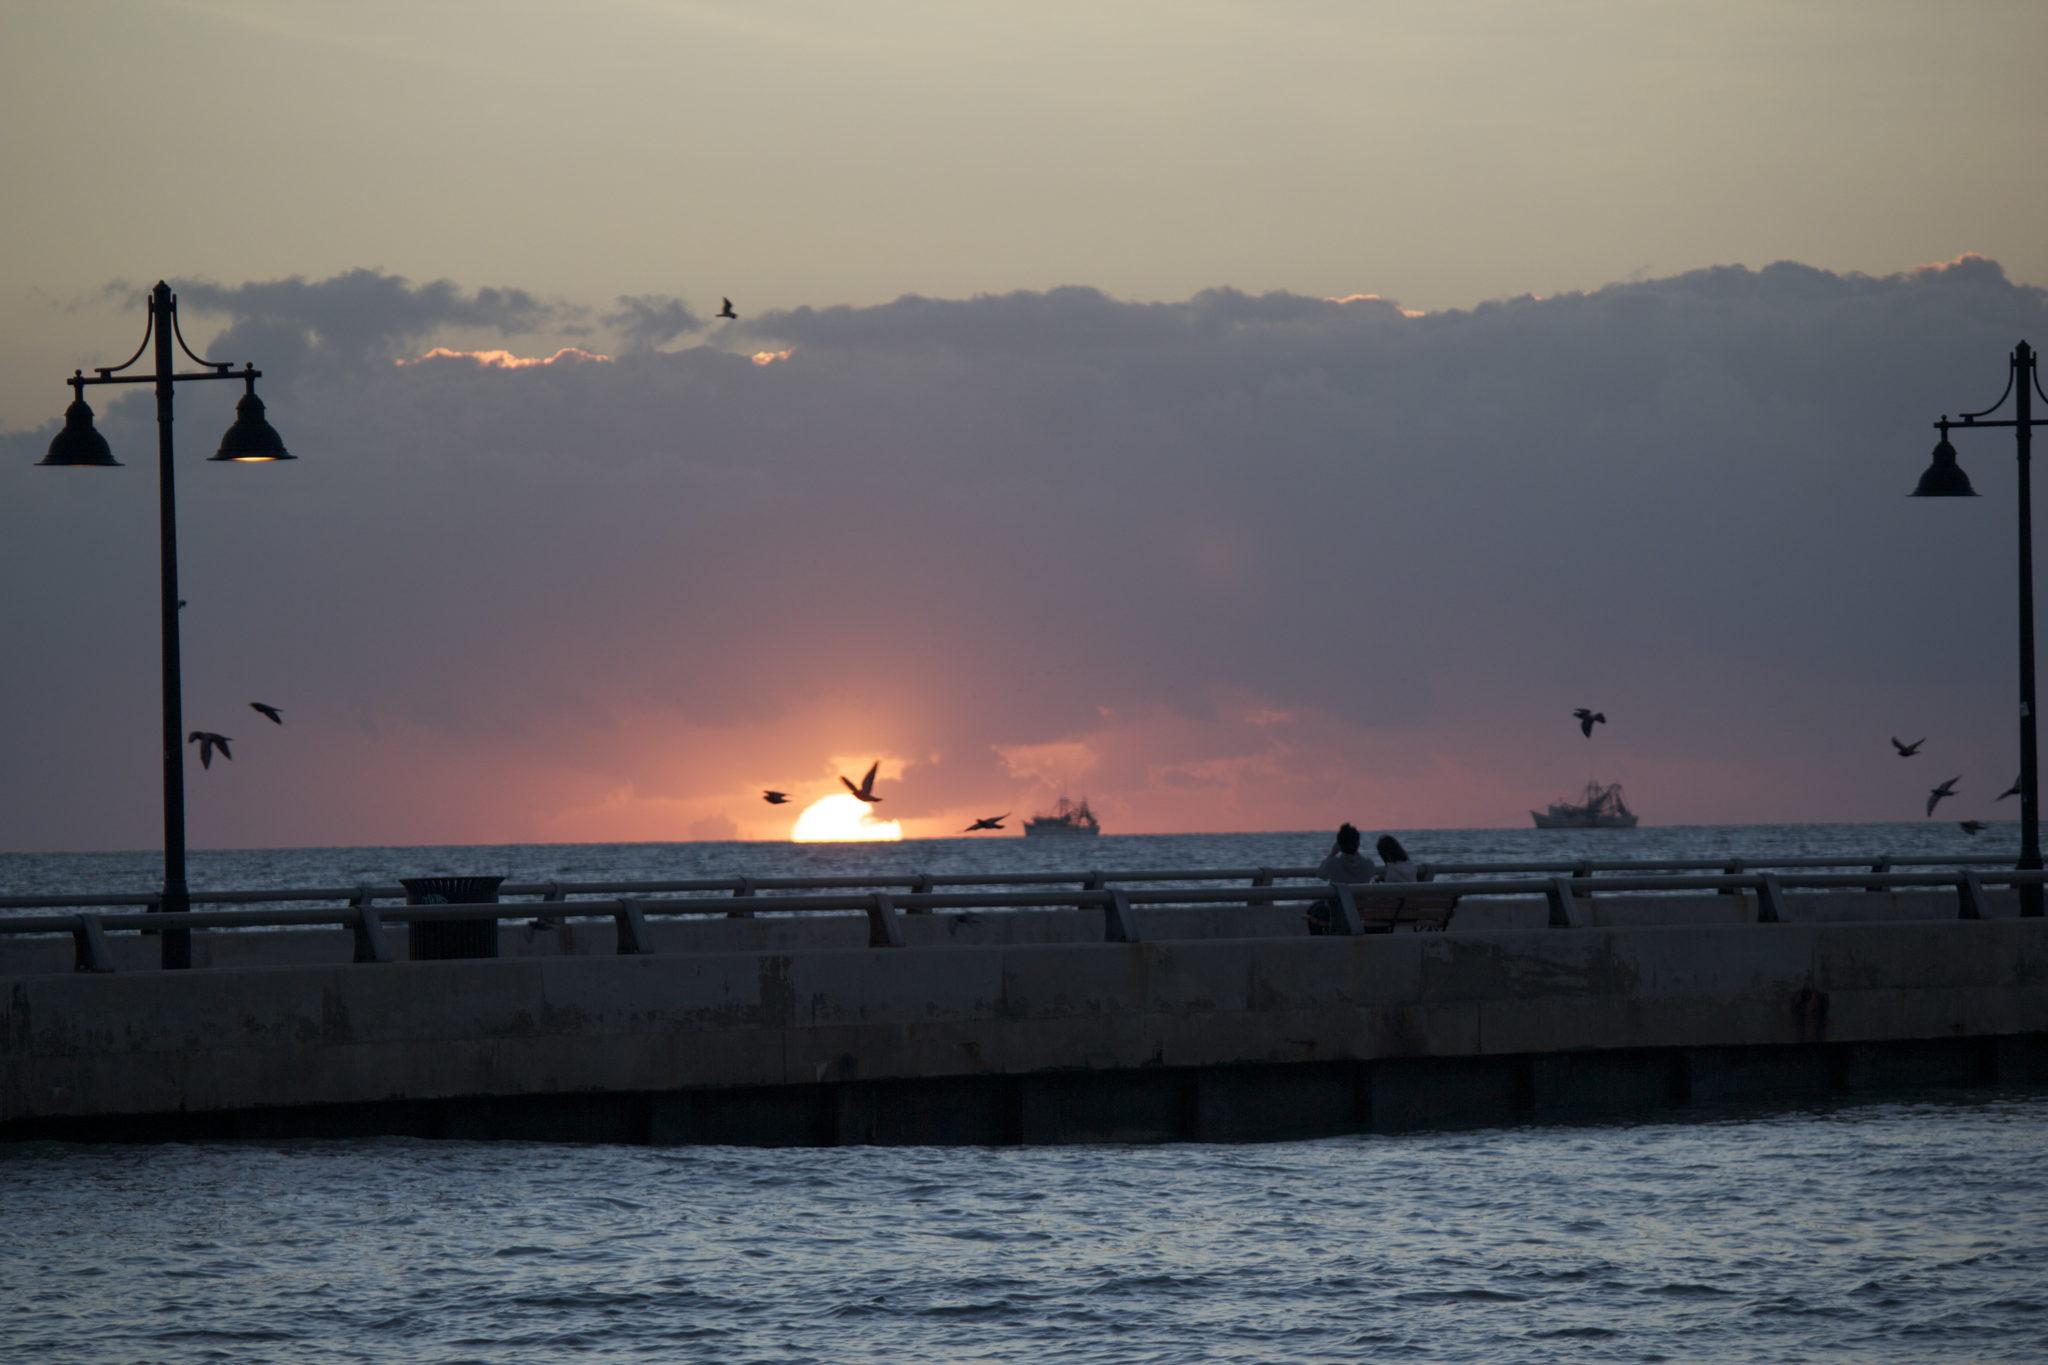 Sunrise in Key West, FL